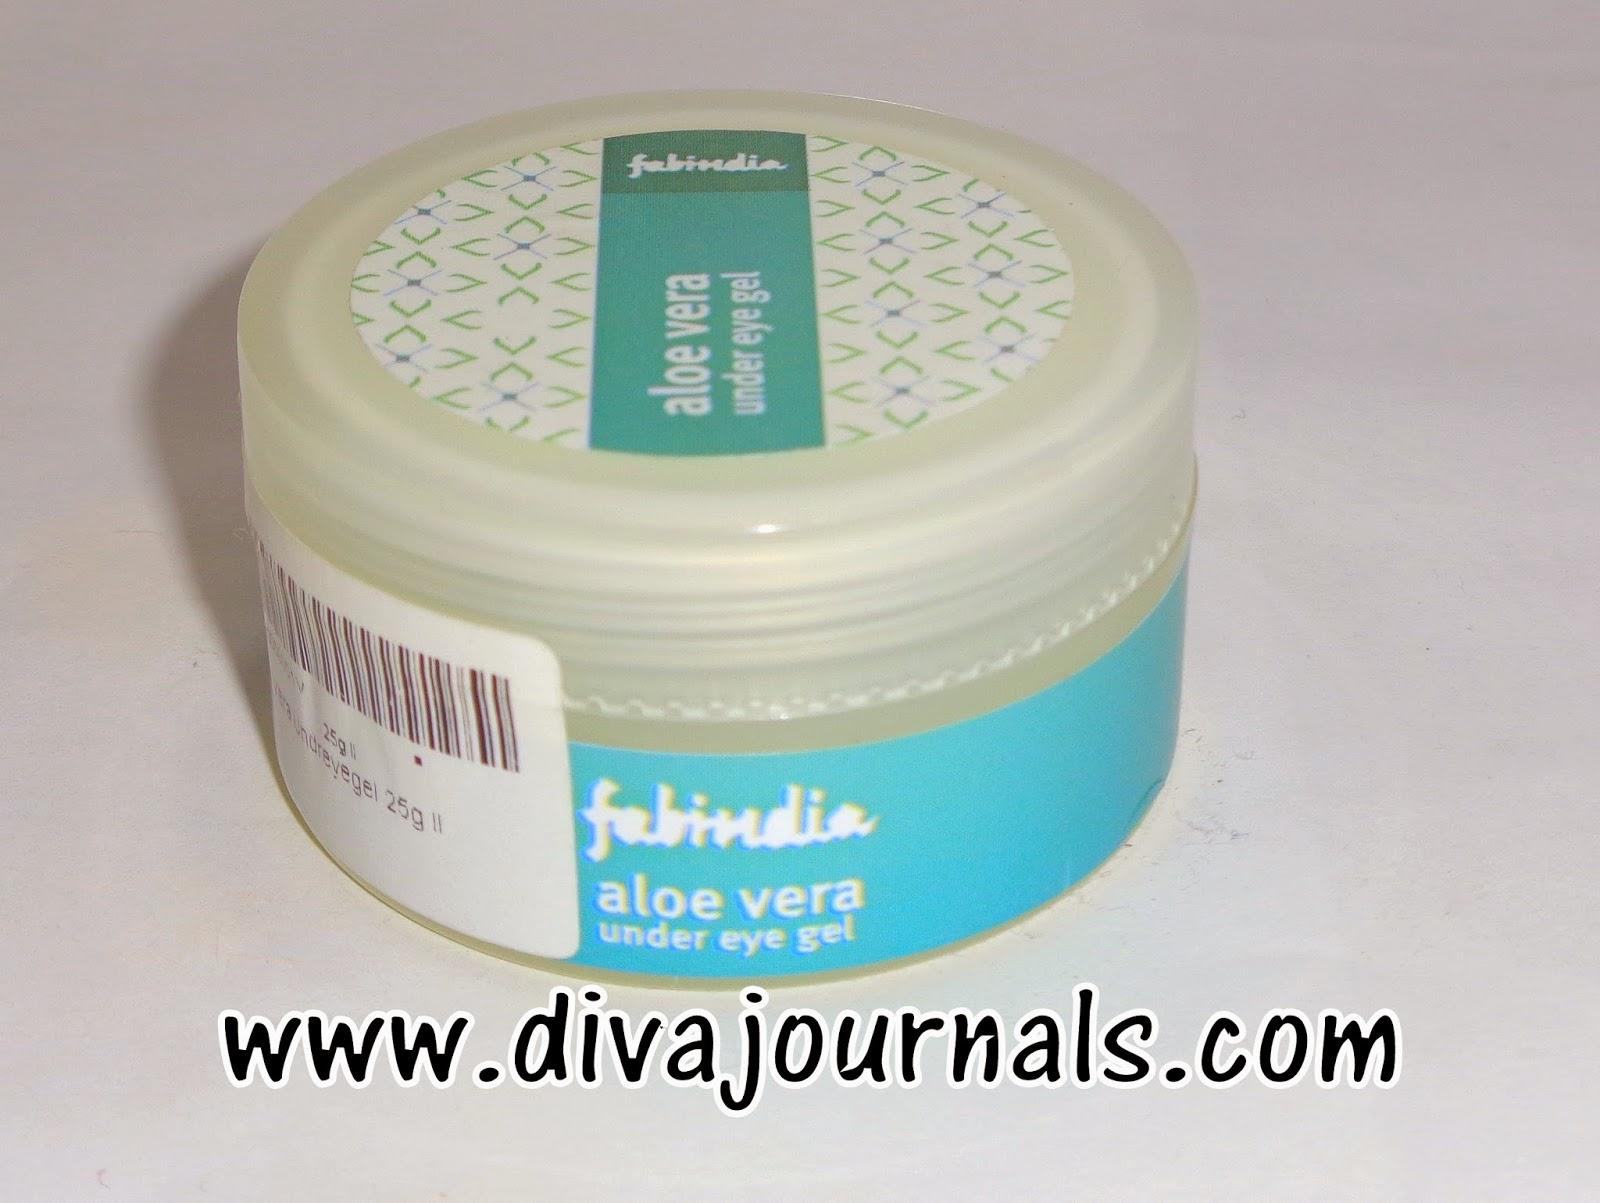 FabIndia Aloe Vera Under Eye Gel Review